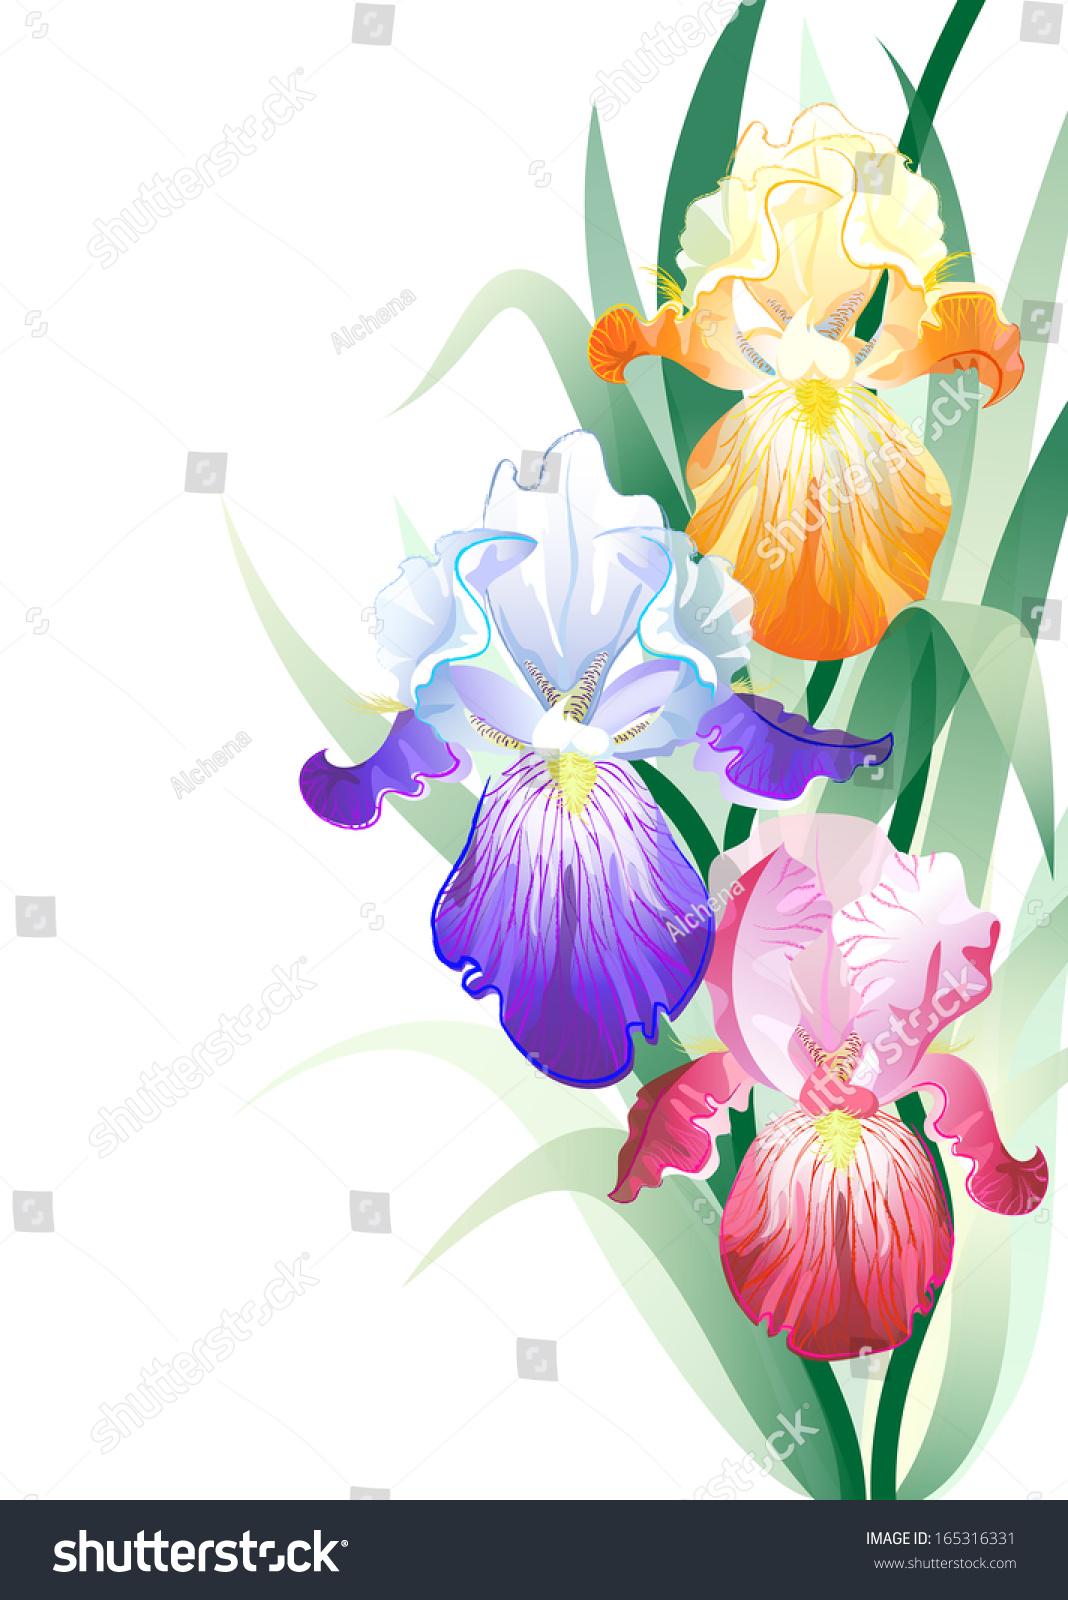 Vector holidays card iris flowers bouquet stock vector royalty free vector holidays card with iris flowers bouquet izmirmasajfo